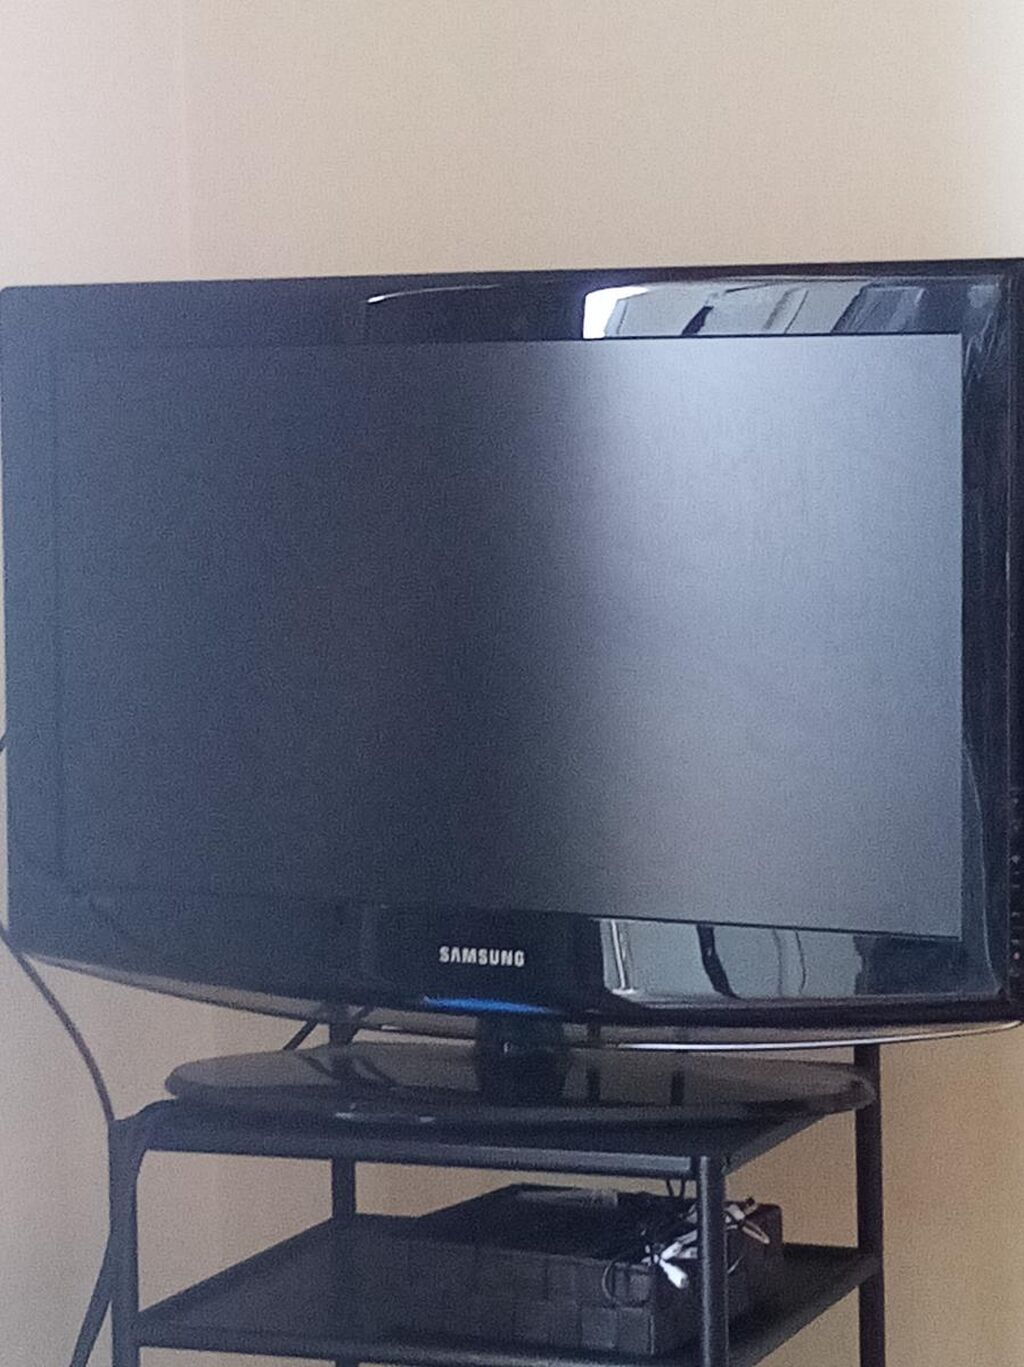 Tηλεοραση Samsung L32r86bd